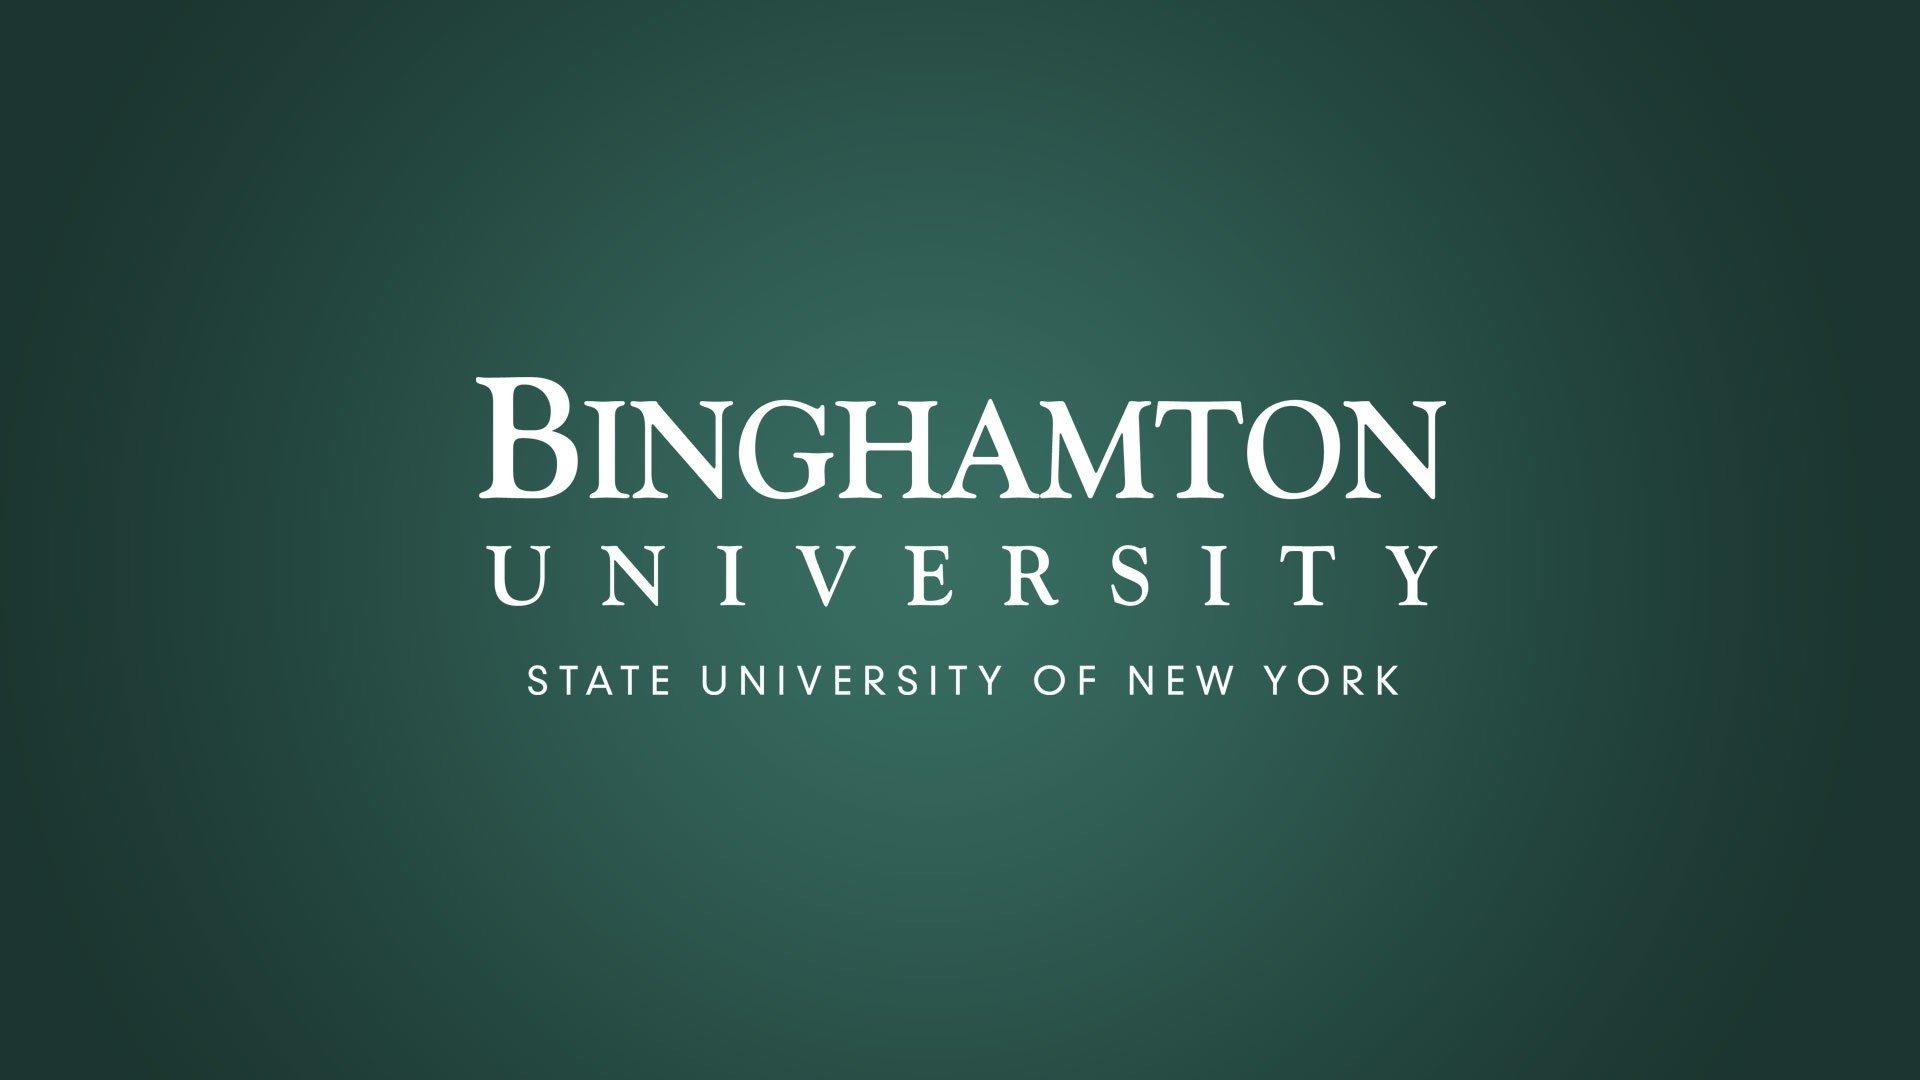 Binghamton Calendar 2022.Binghamton University Prepares For The Rest Of The Year Wicz